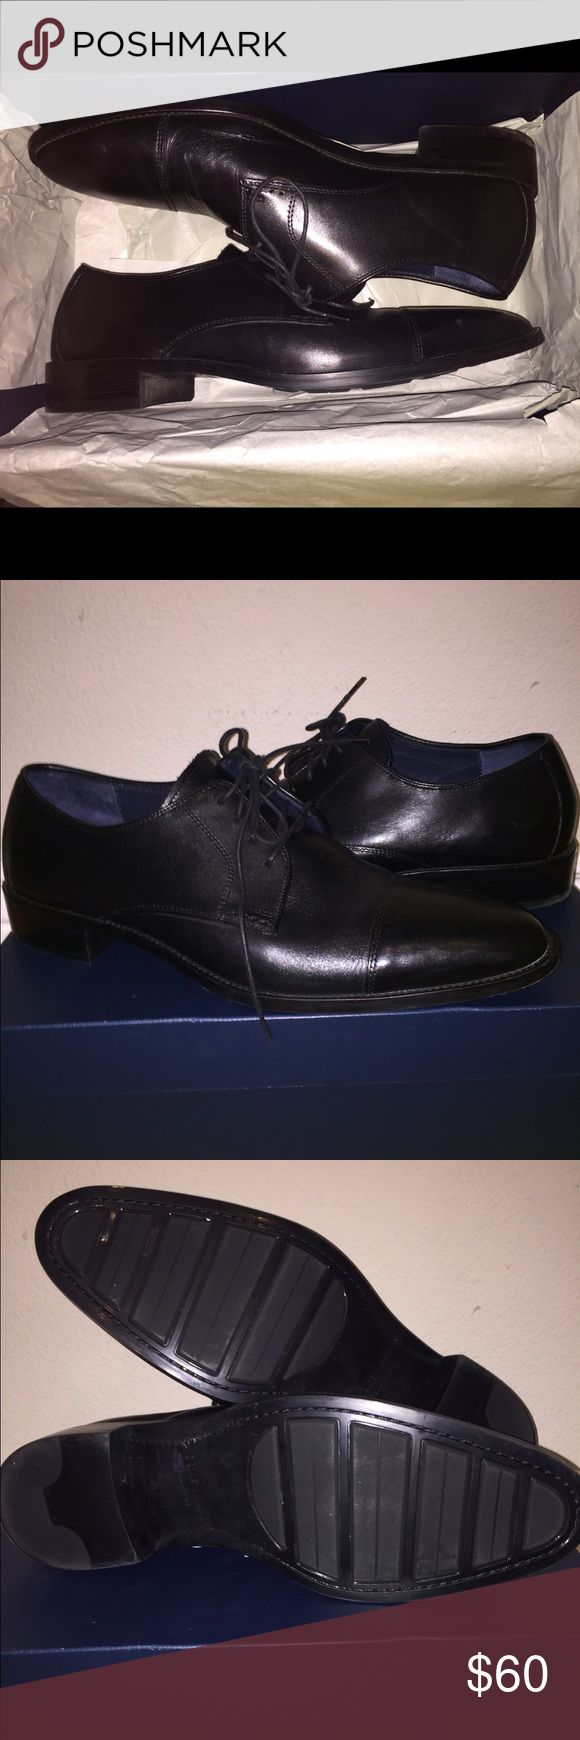 Cole Haan dress shoes loafers lace up black Cole Haan dress shoes worn 1x for an event never worn again!!! Cole Haan Shoes Oxfords & Derbys